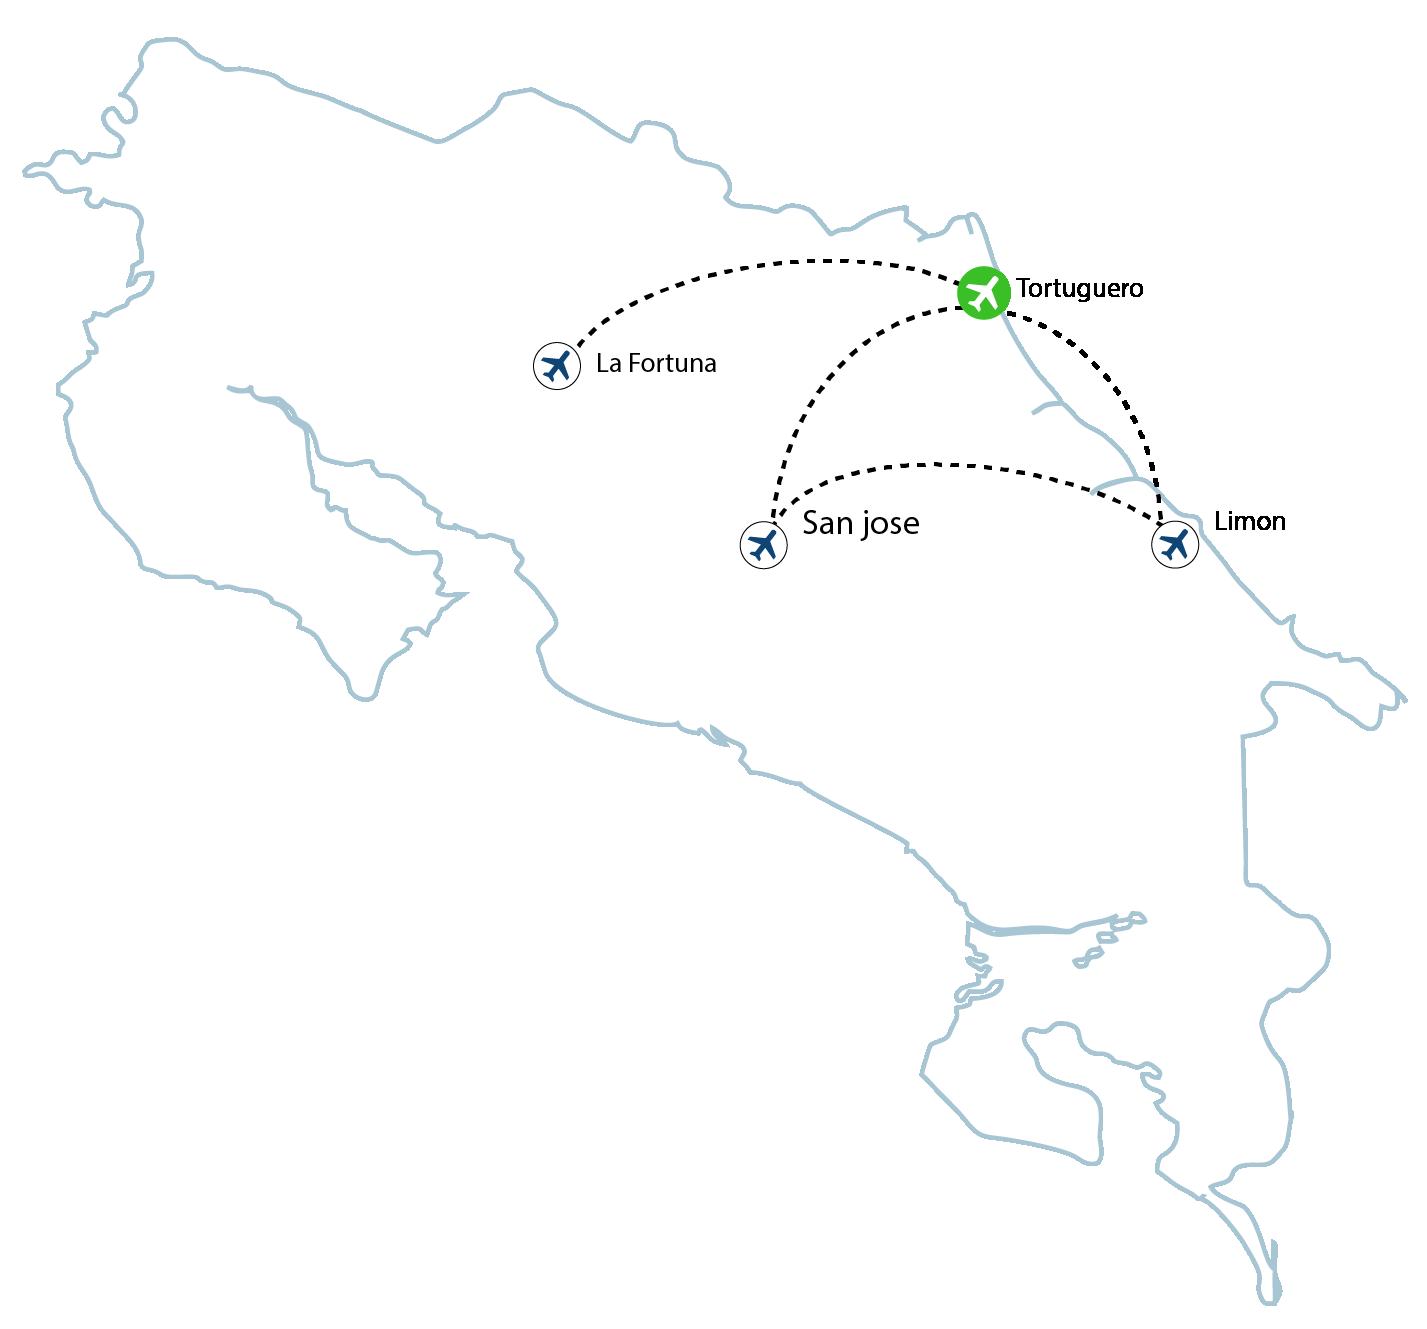 map tortuguero 01 - Tortuguero Flights